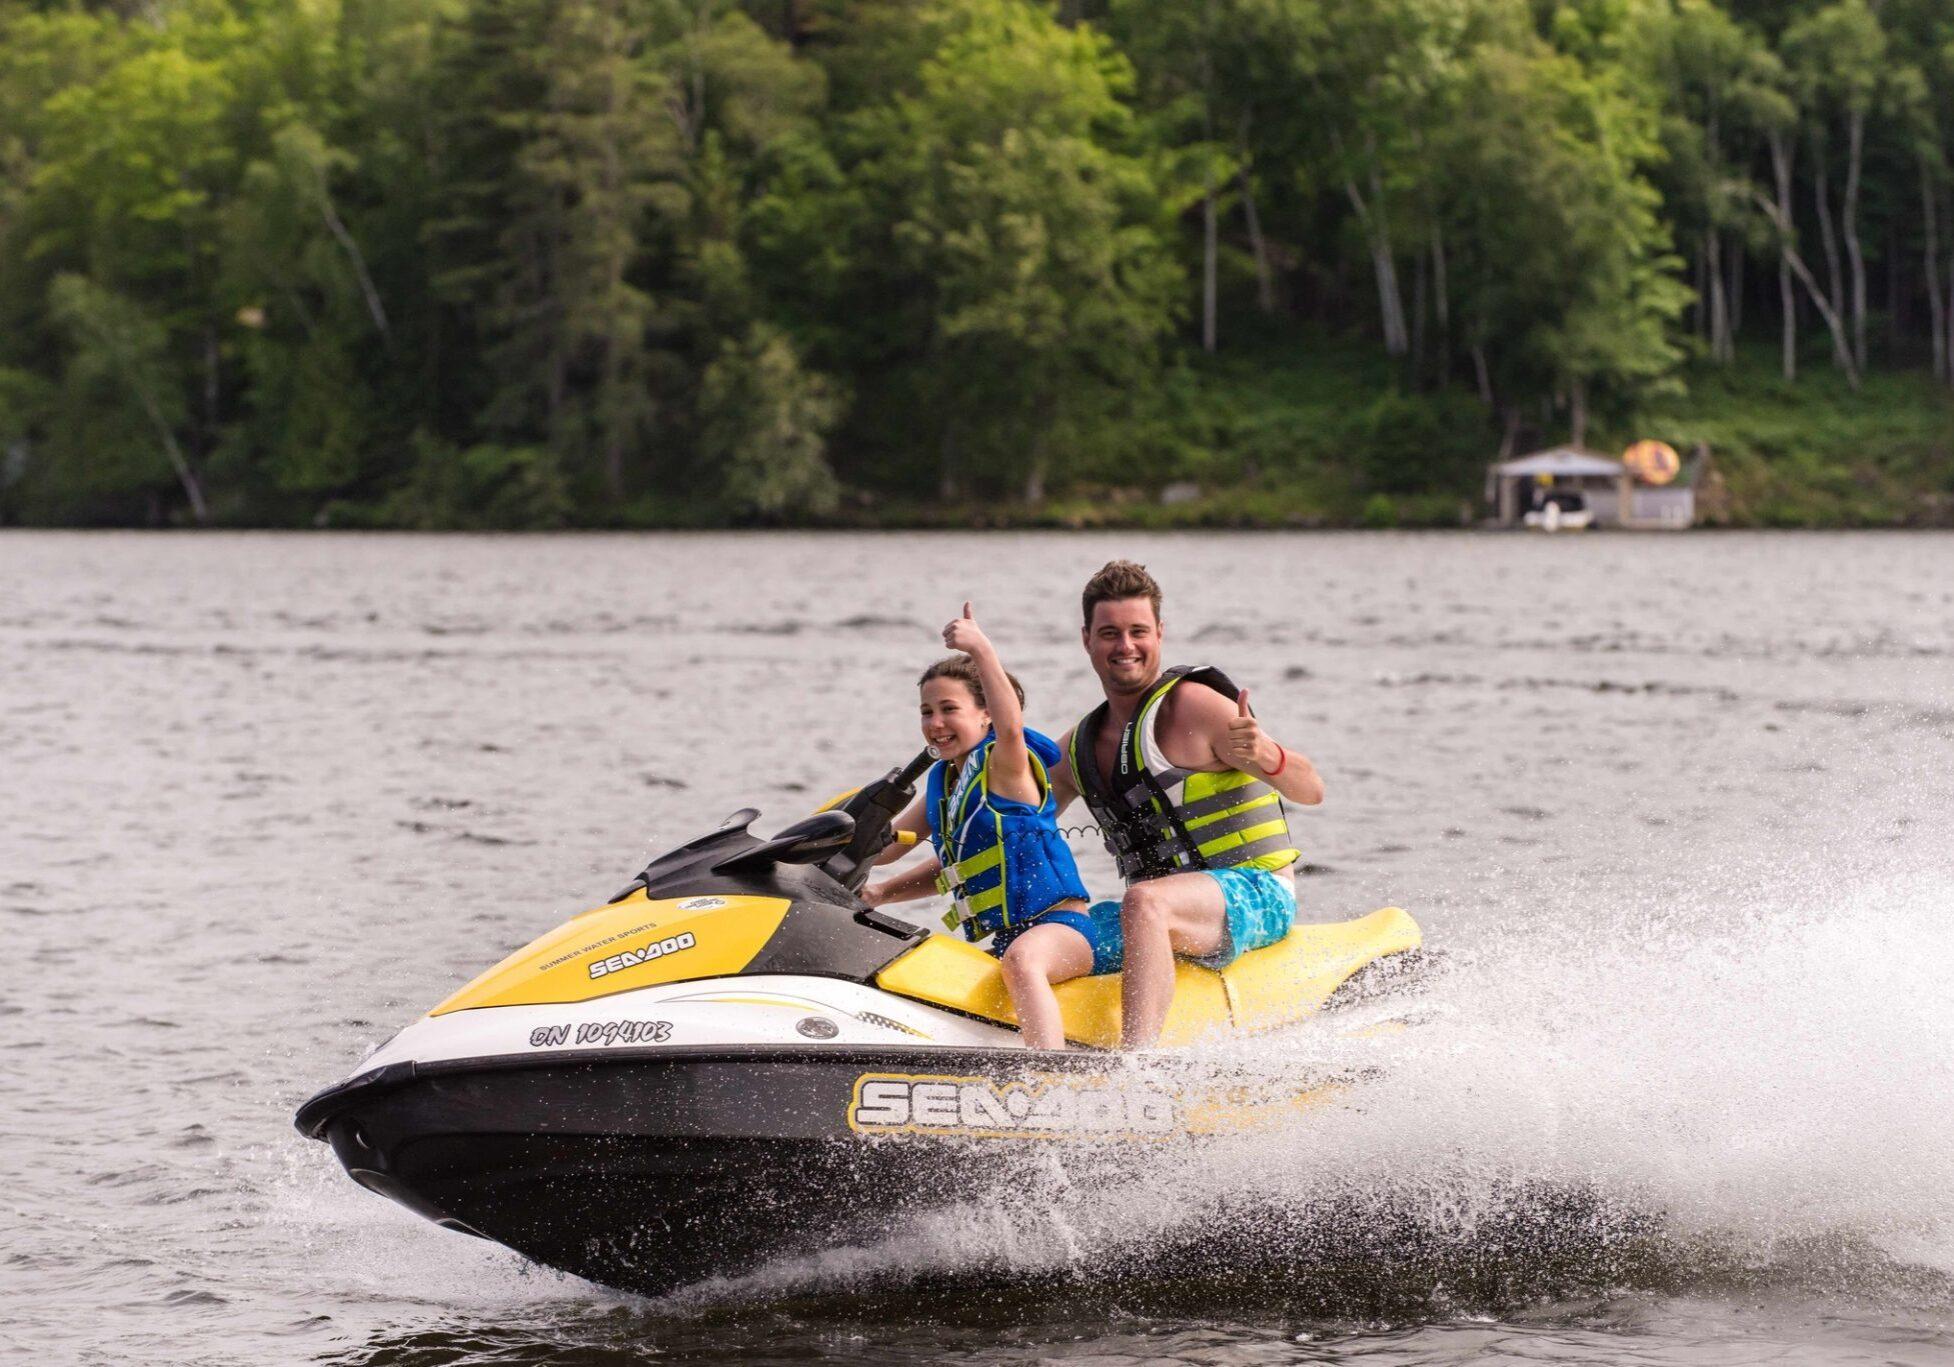 Deerhurst Resort water fun on a jet ski